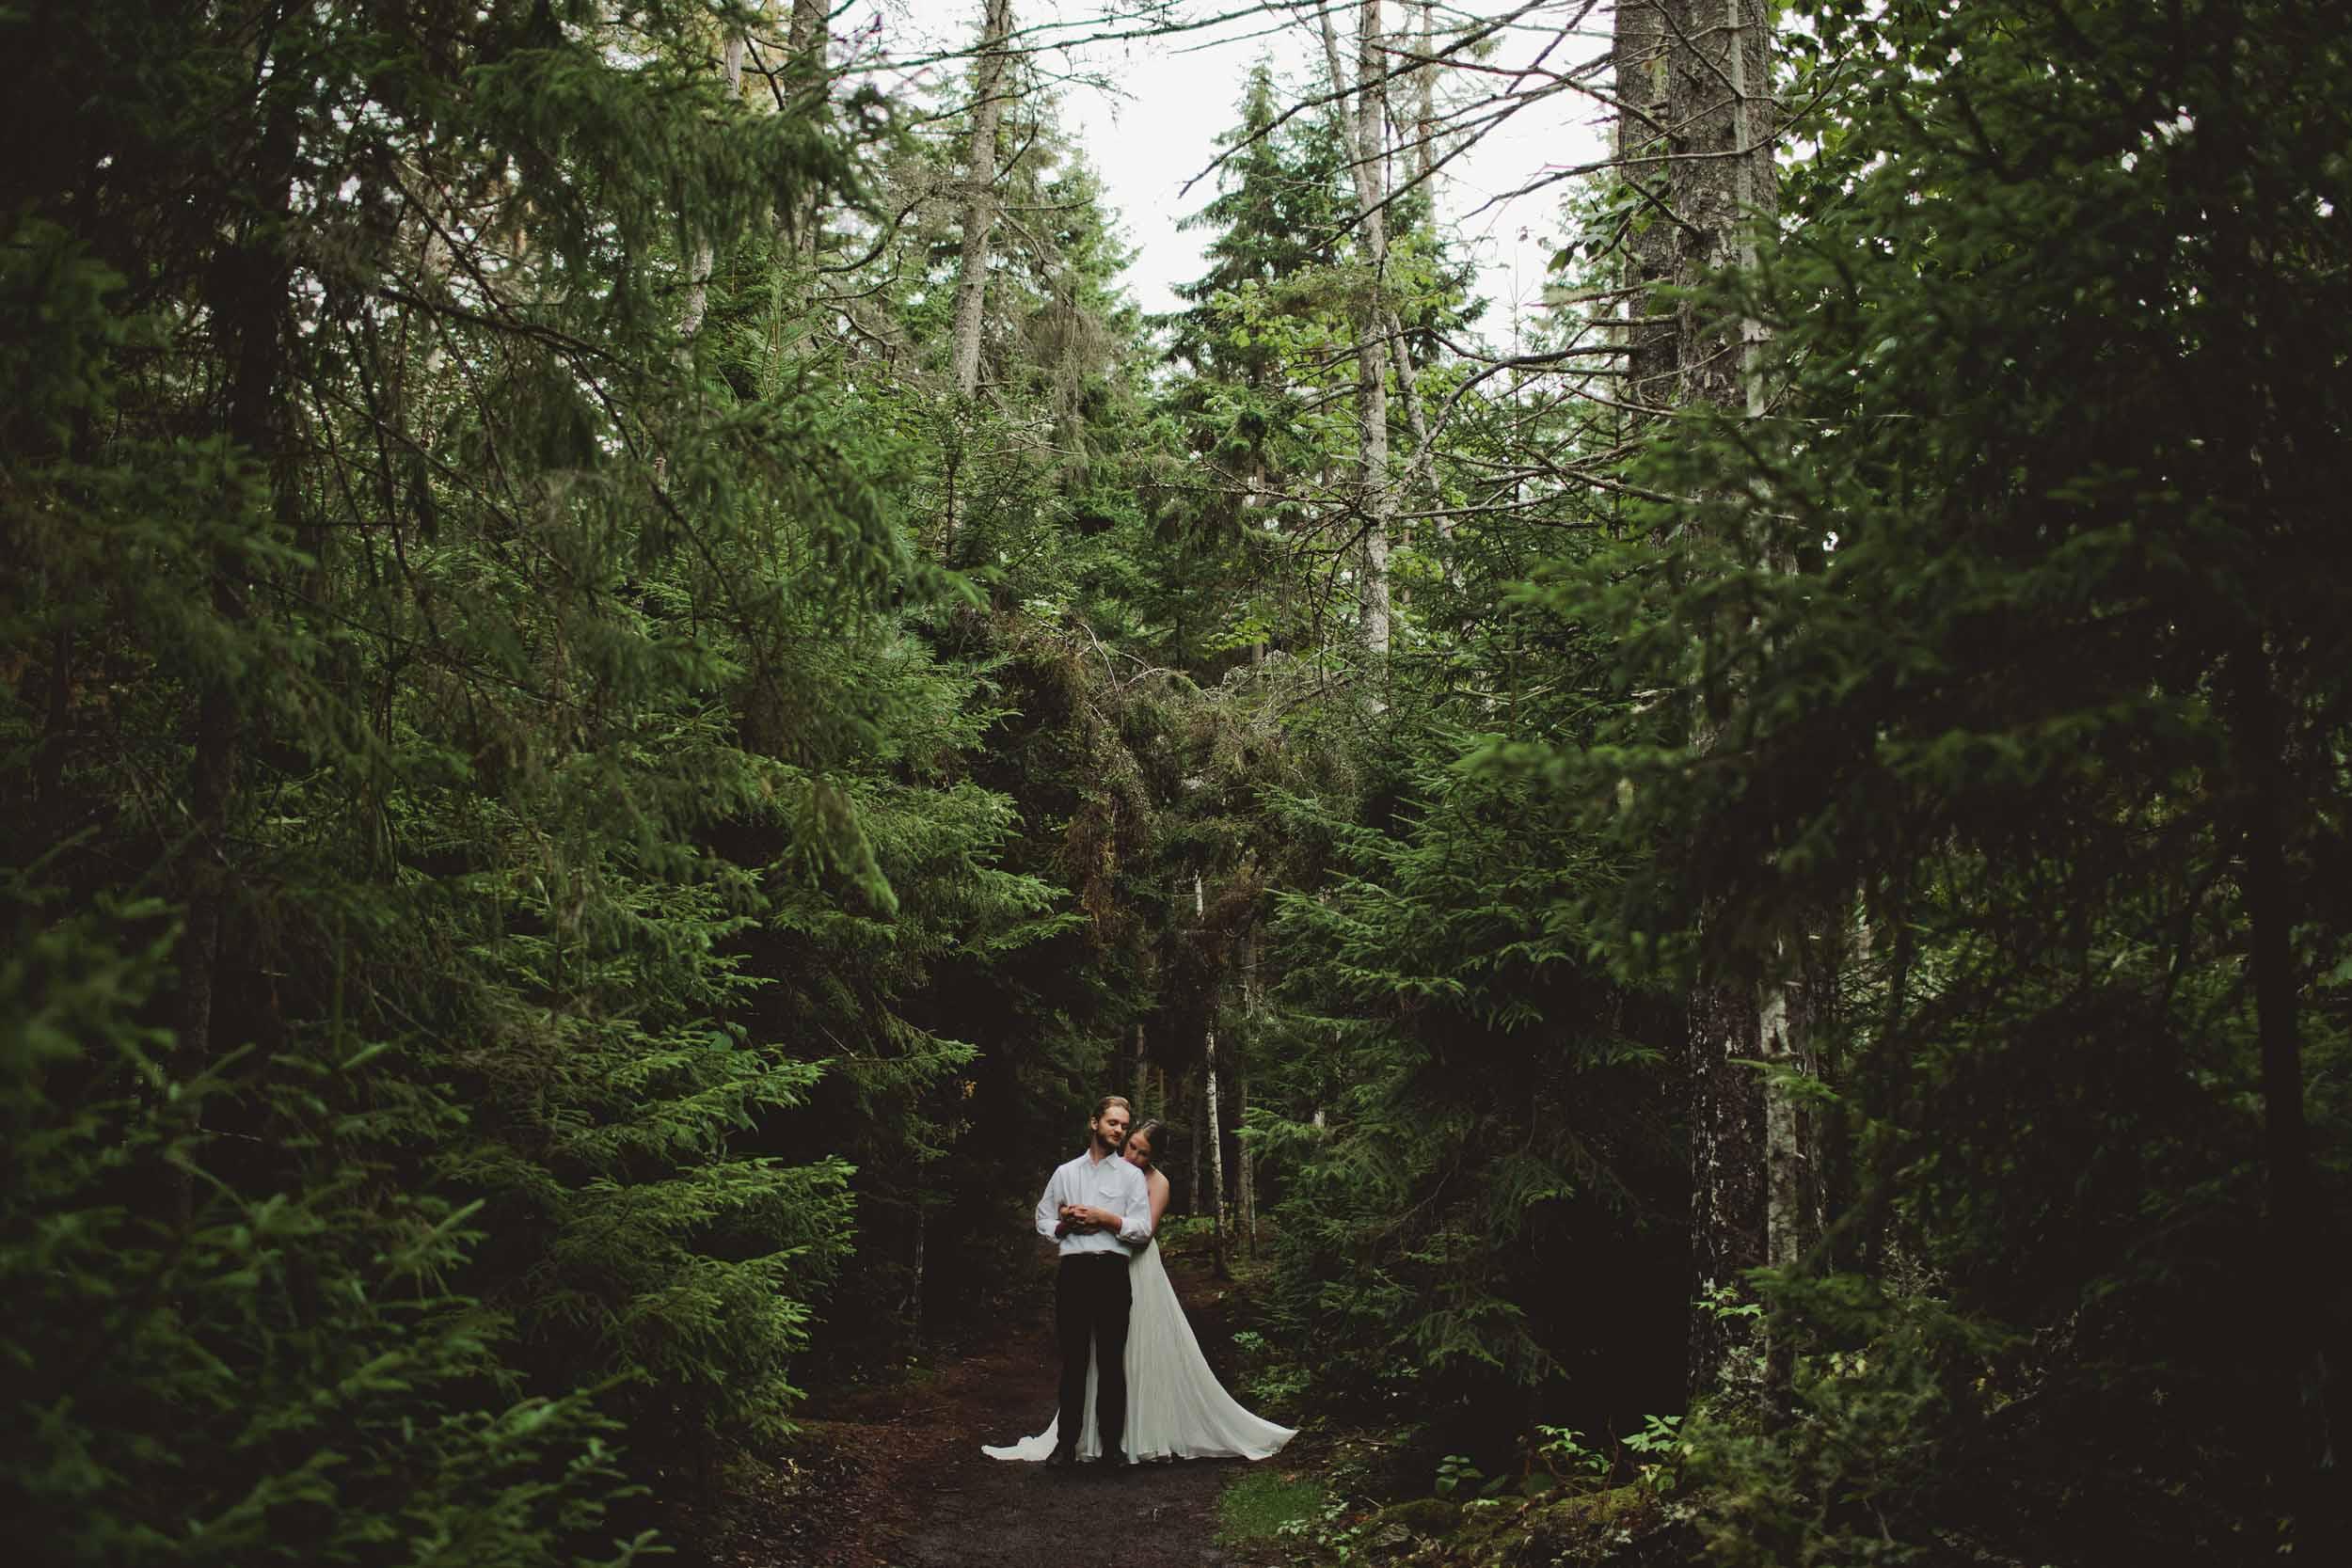 Maine-Elopement-Photographer10.jpg